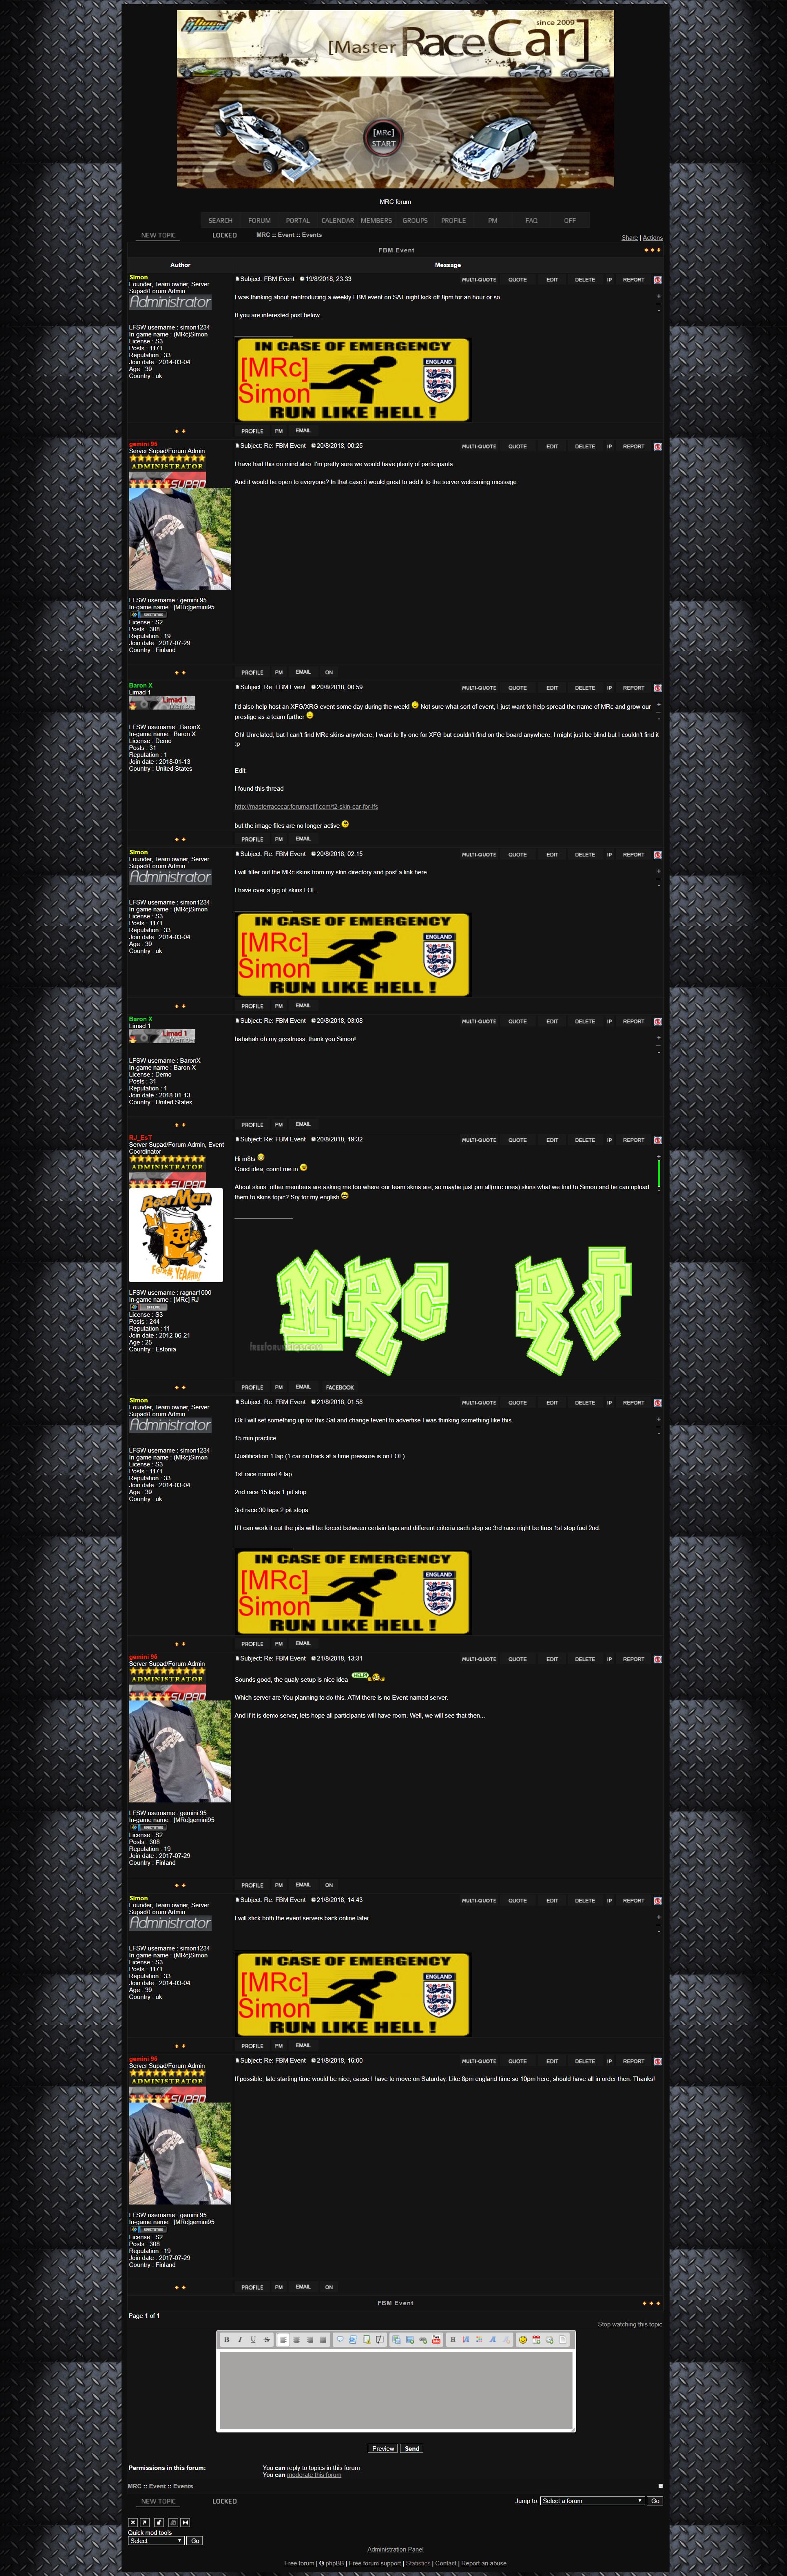 [Image: screencapture-masterracecar-forumactif-t...-47-36.jpg]